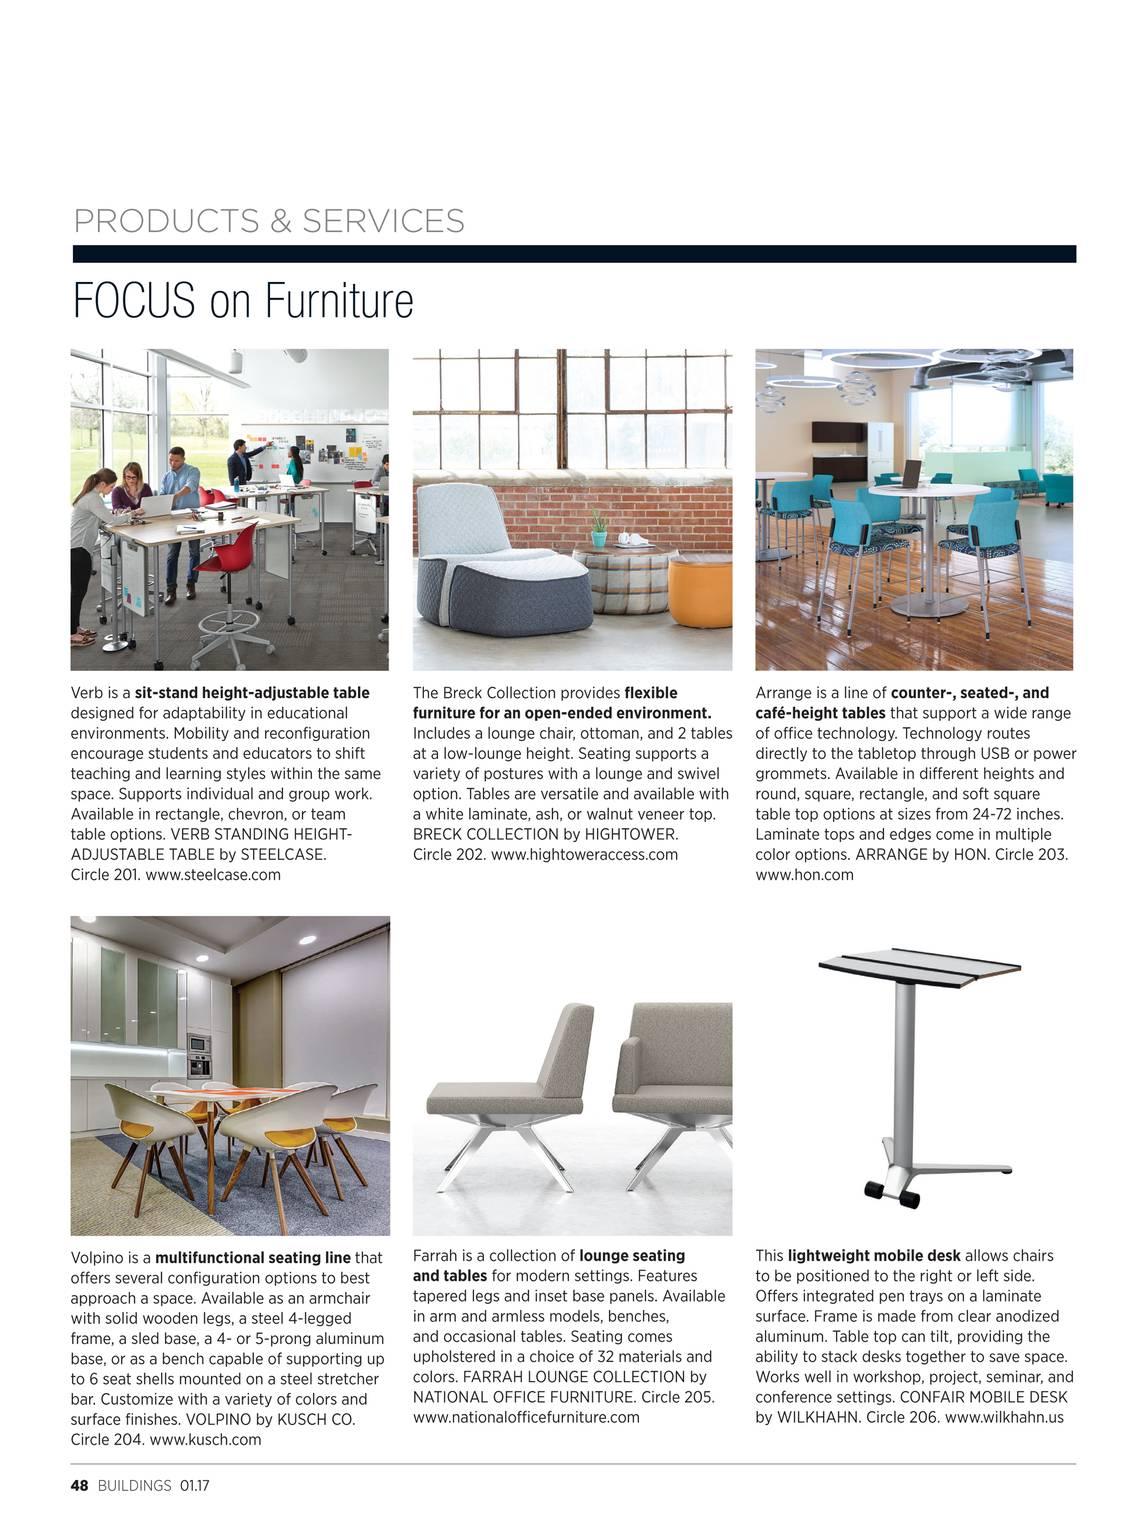 Fabulous Buildings Magazine October 2017 Page 49 Machost Co Dining Chair Design Ideas Machostcouk